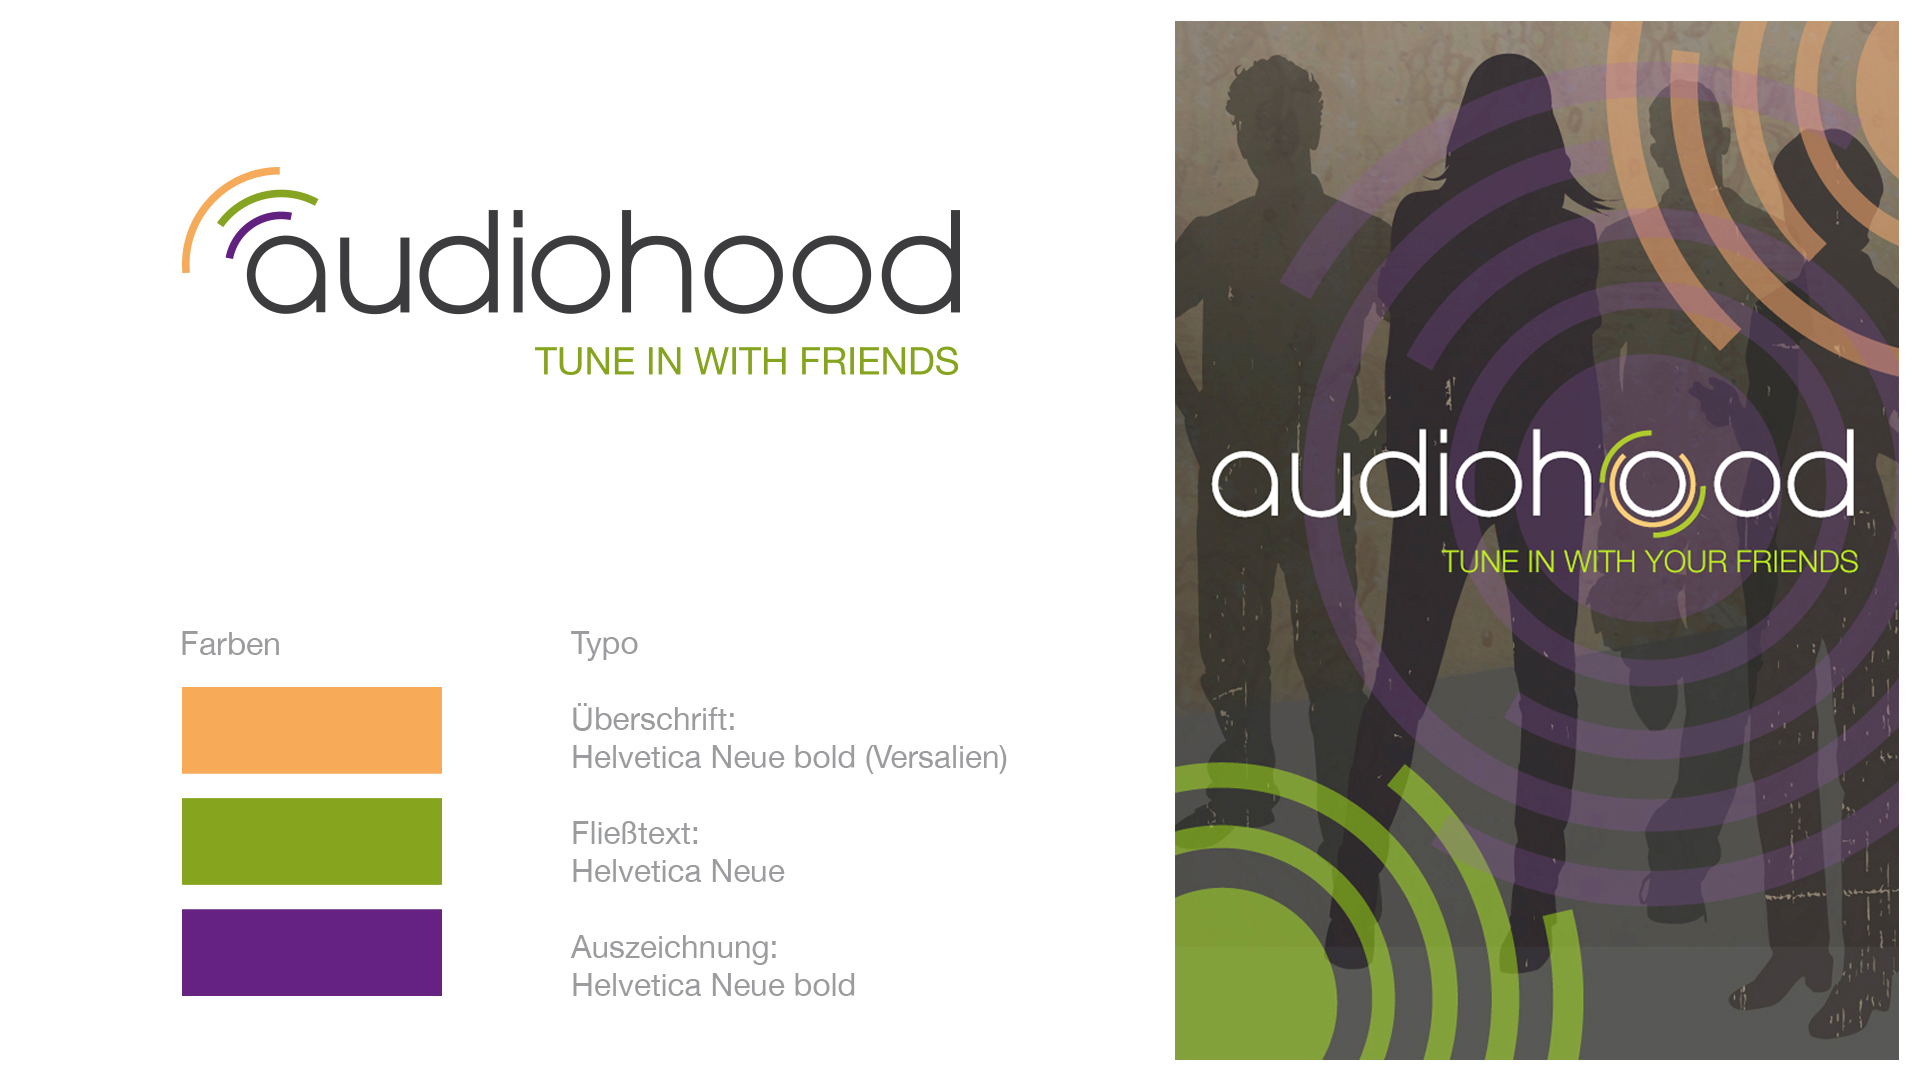 Audiohood.jpg